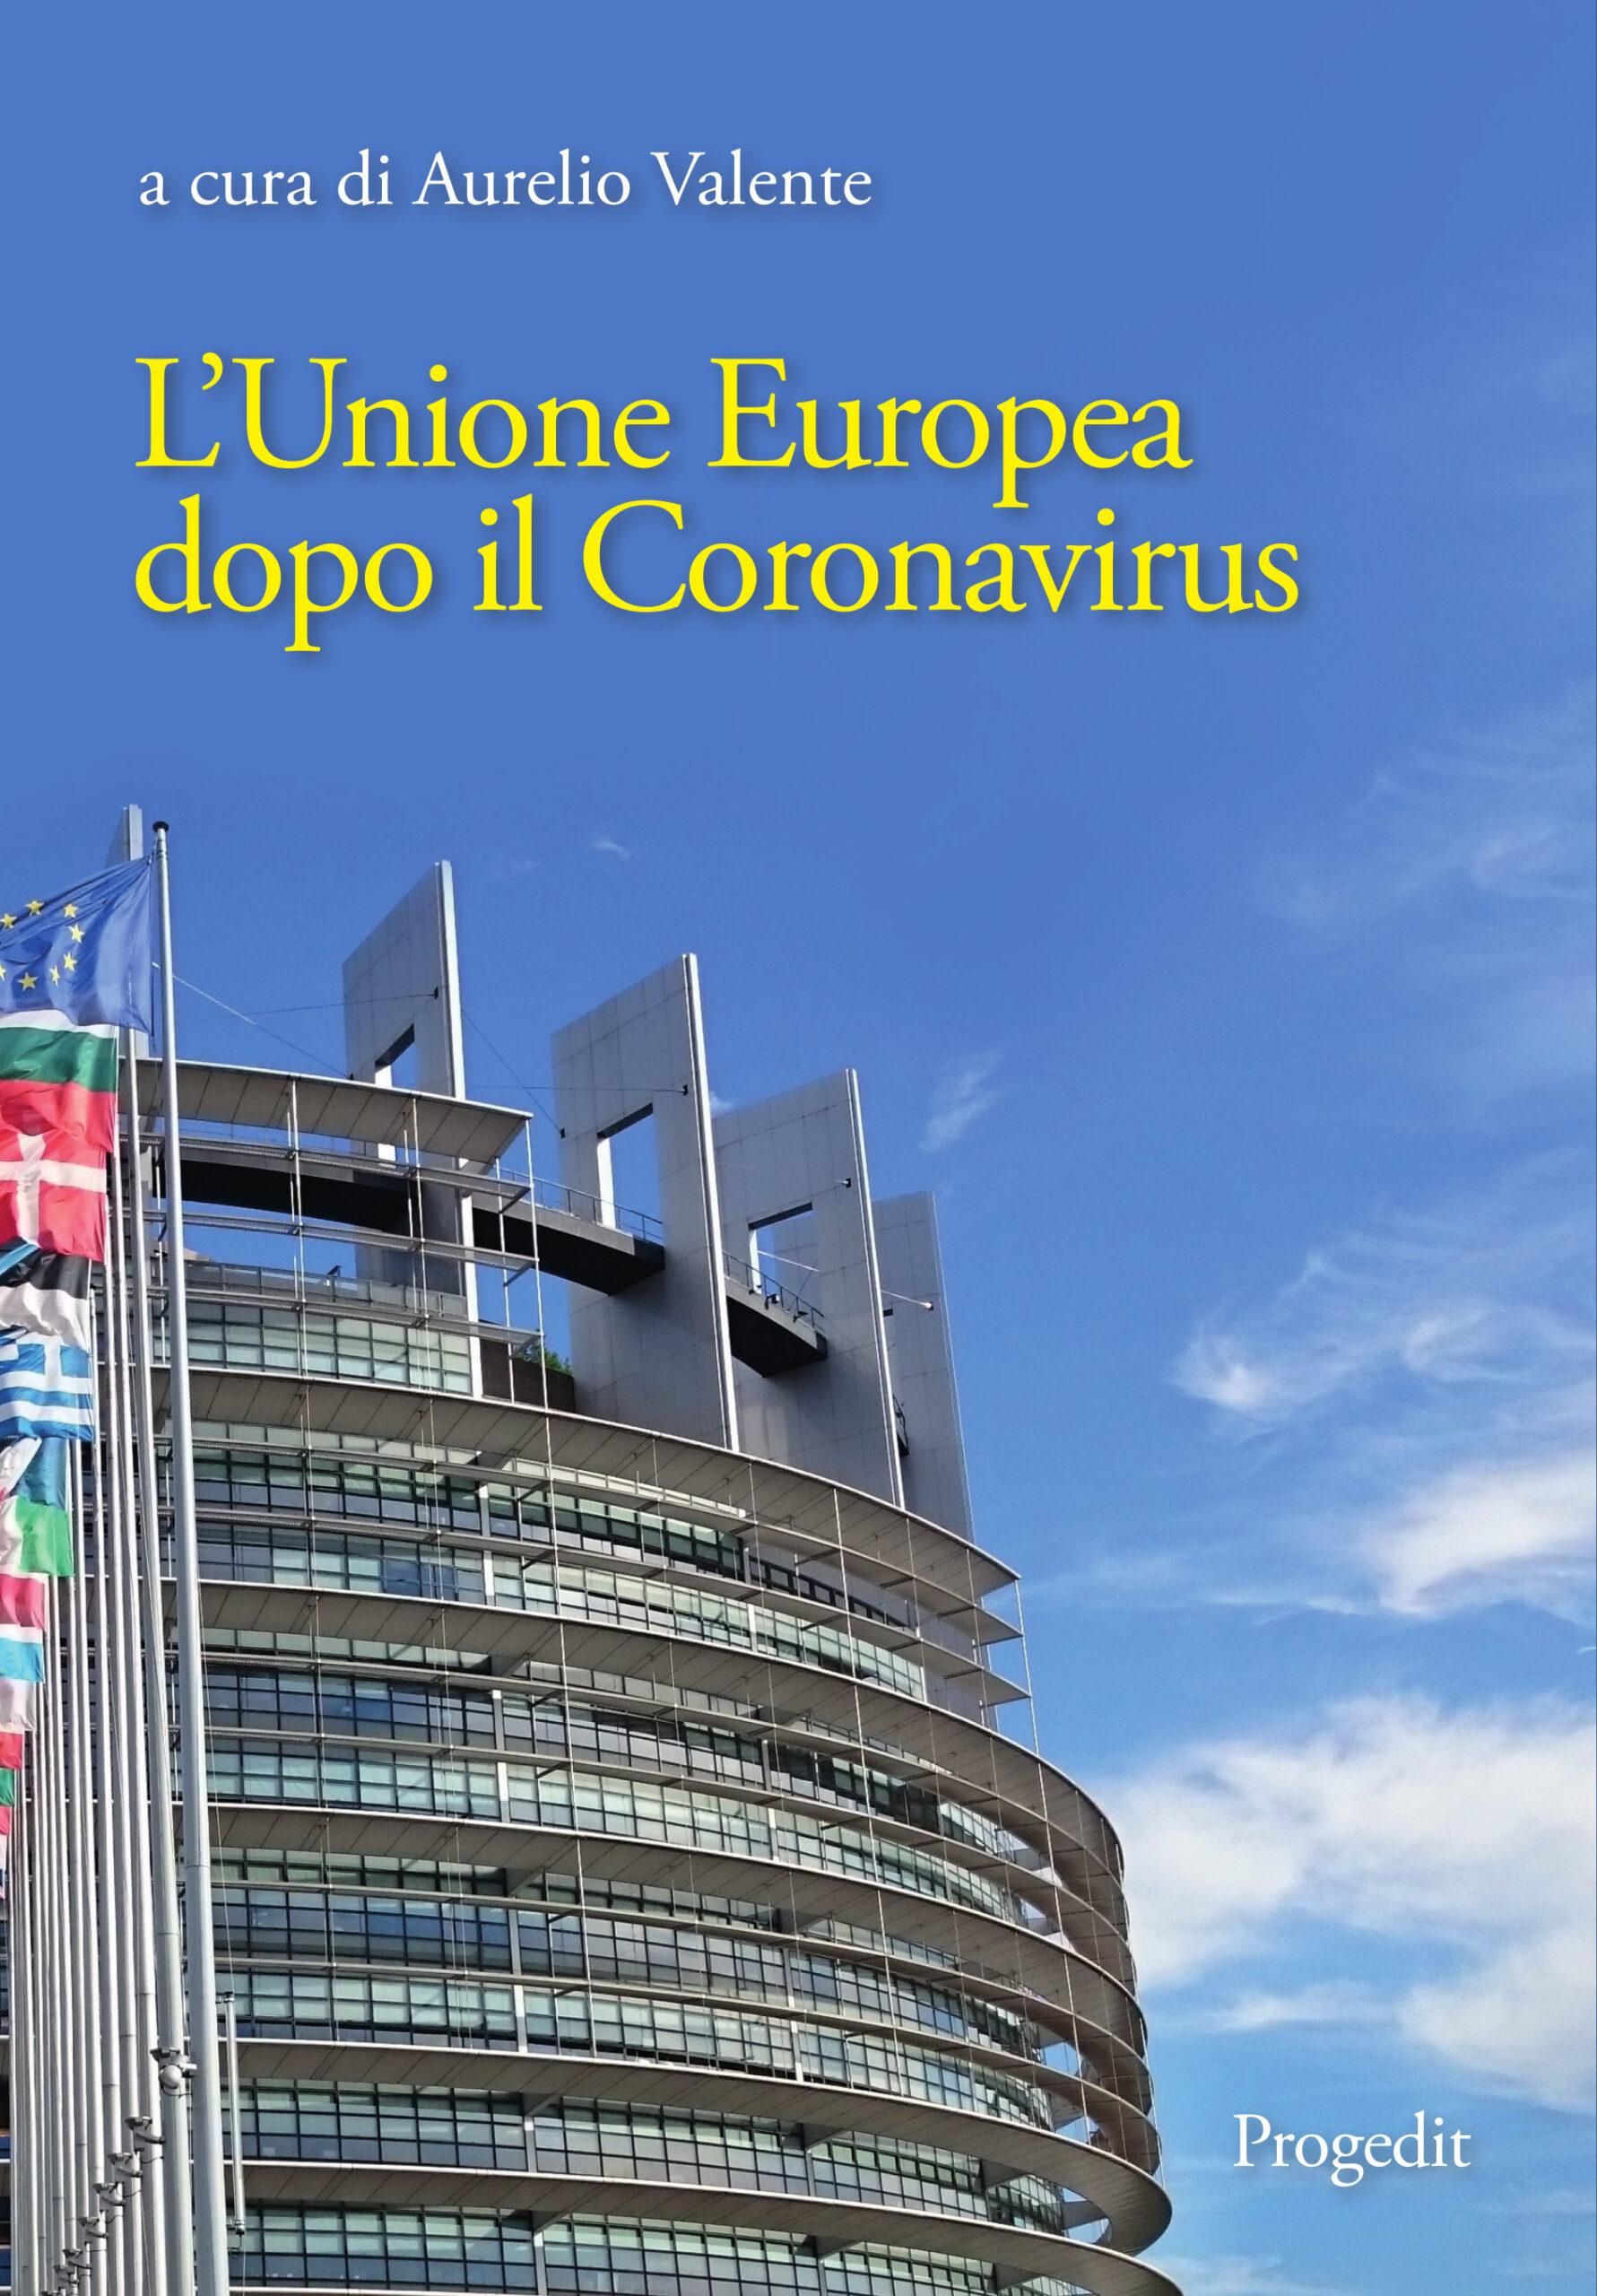 lunioneeuropeadopoilcoronavirus-scaled